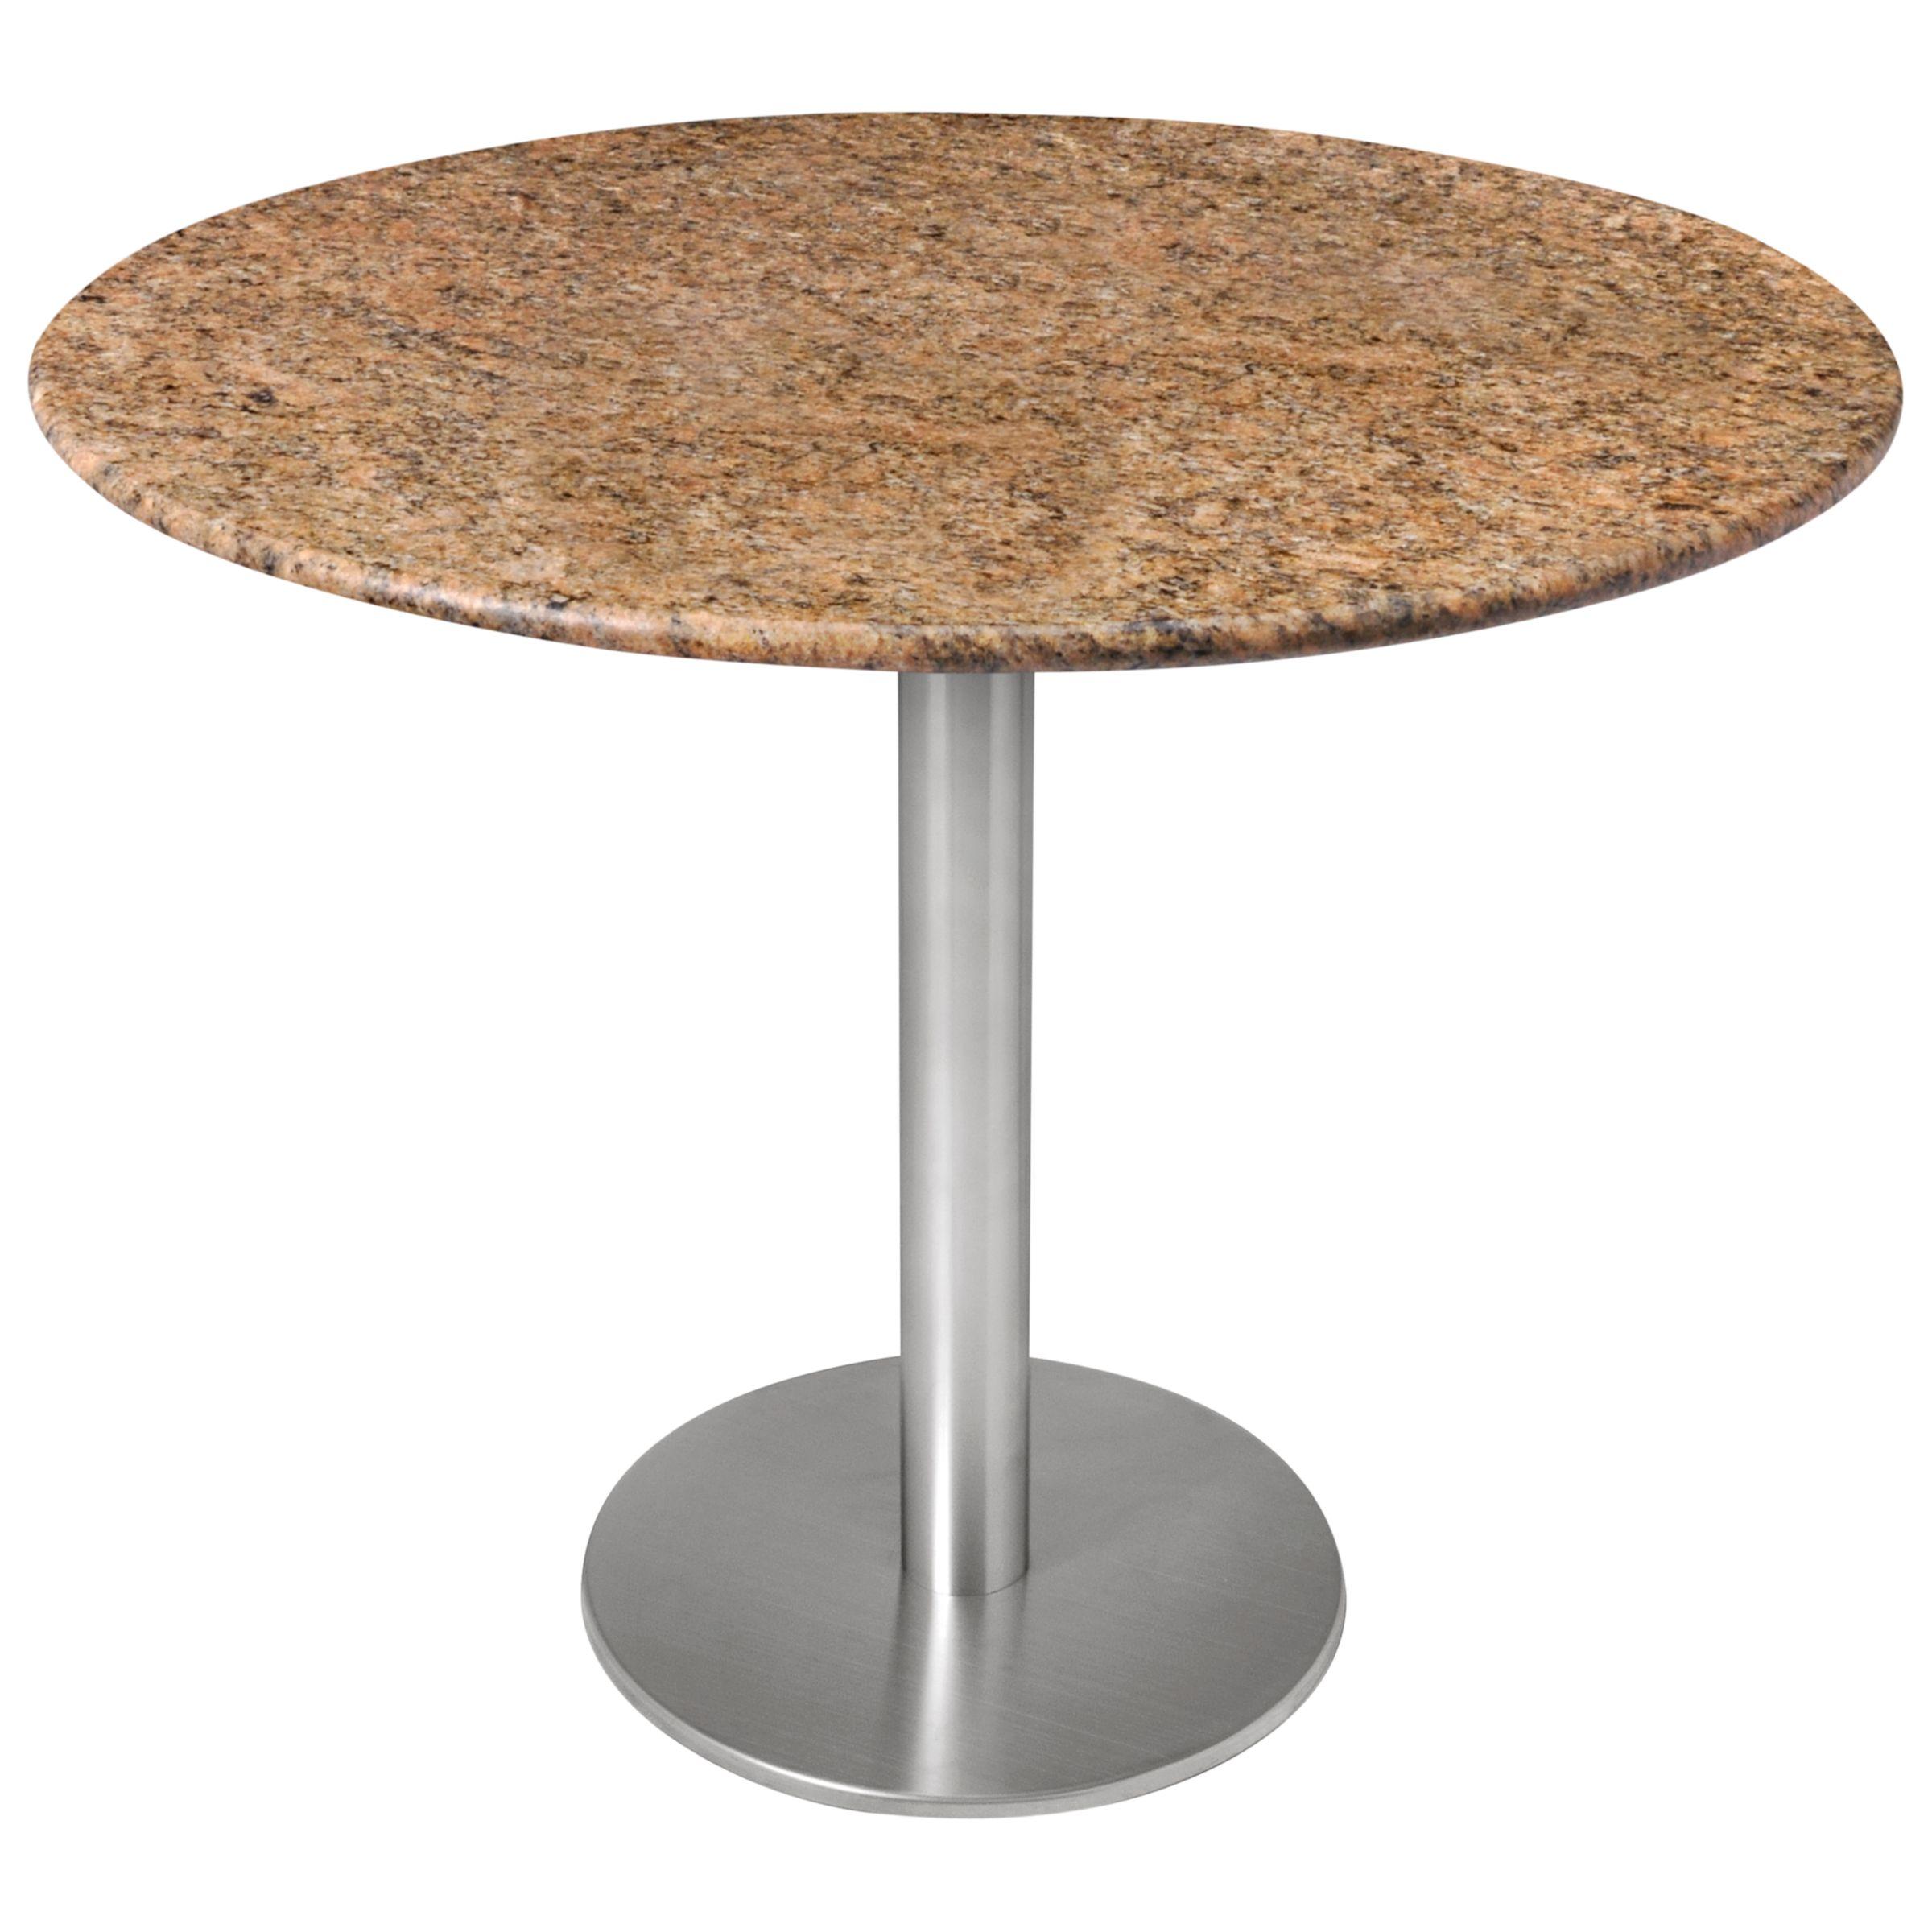 HND Ingrid Granite Dining Table Giallo Venezia : 231289552 from www.modernfurnishingsstore.com size 1600 x 1600 jpeg 247kB